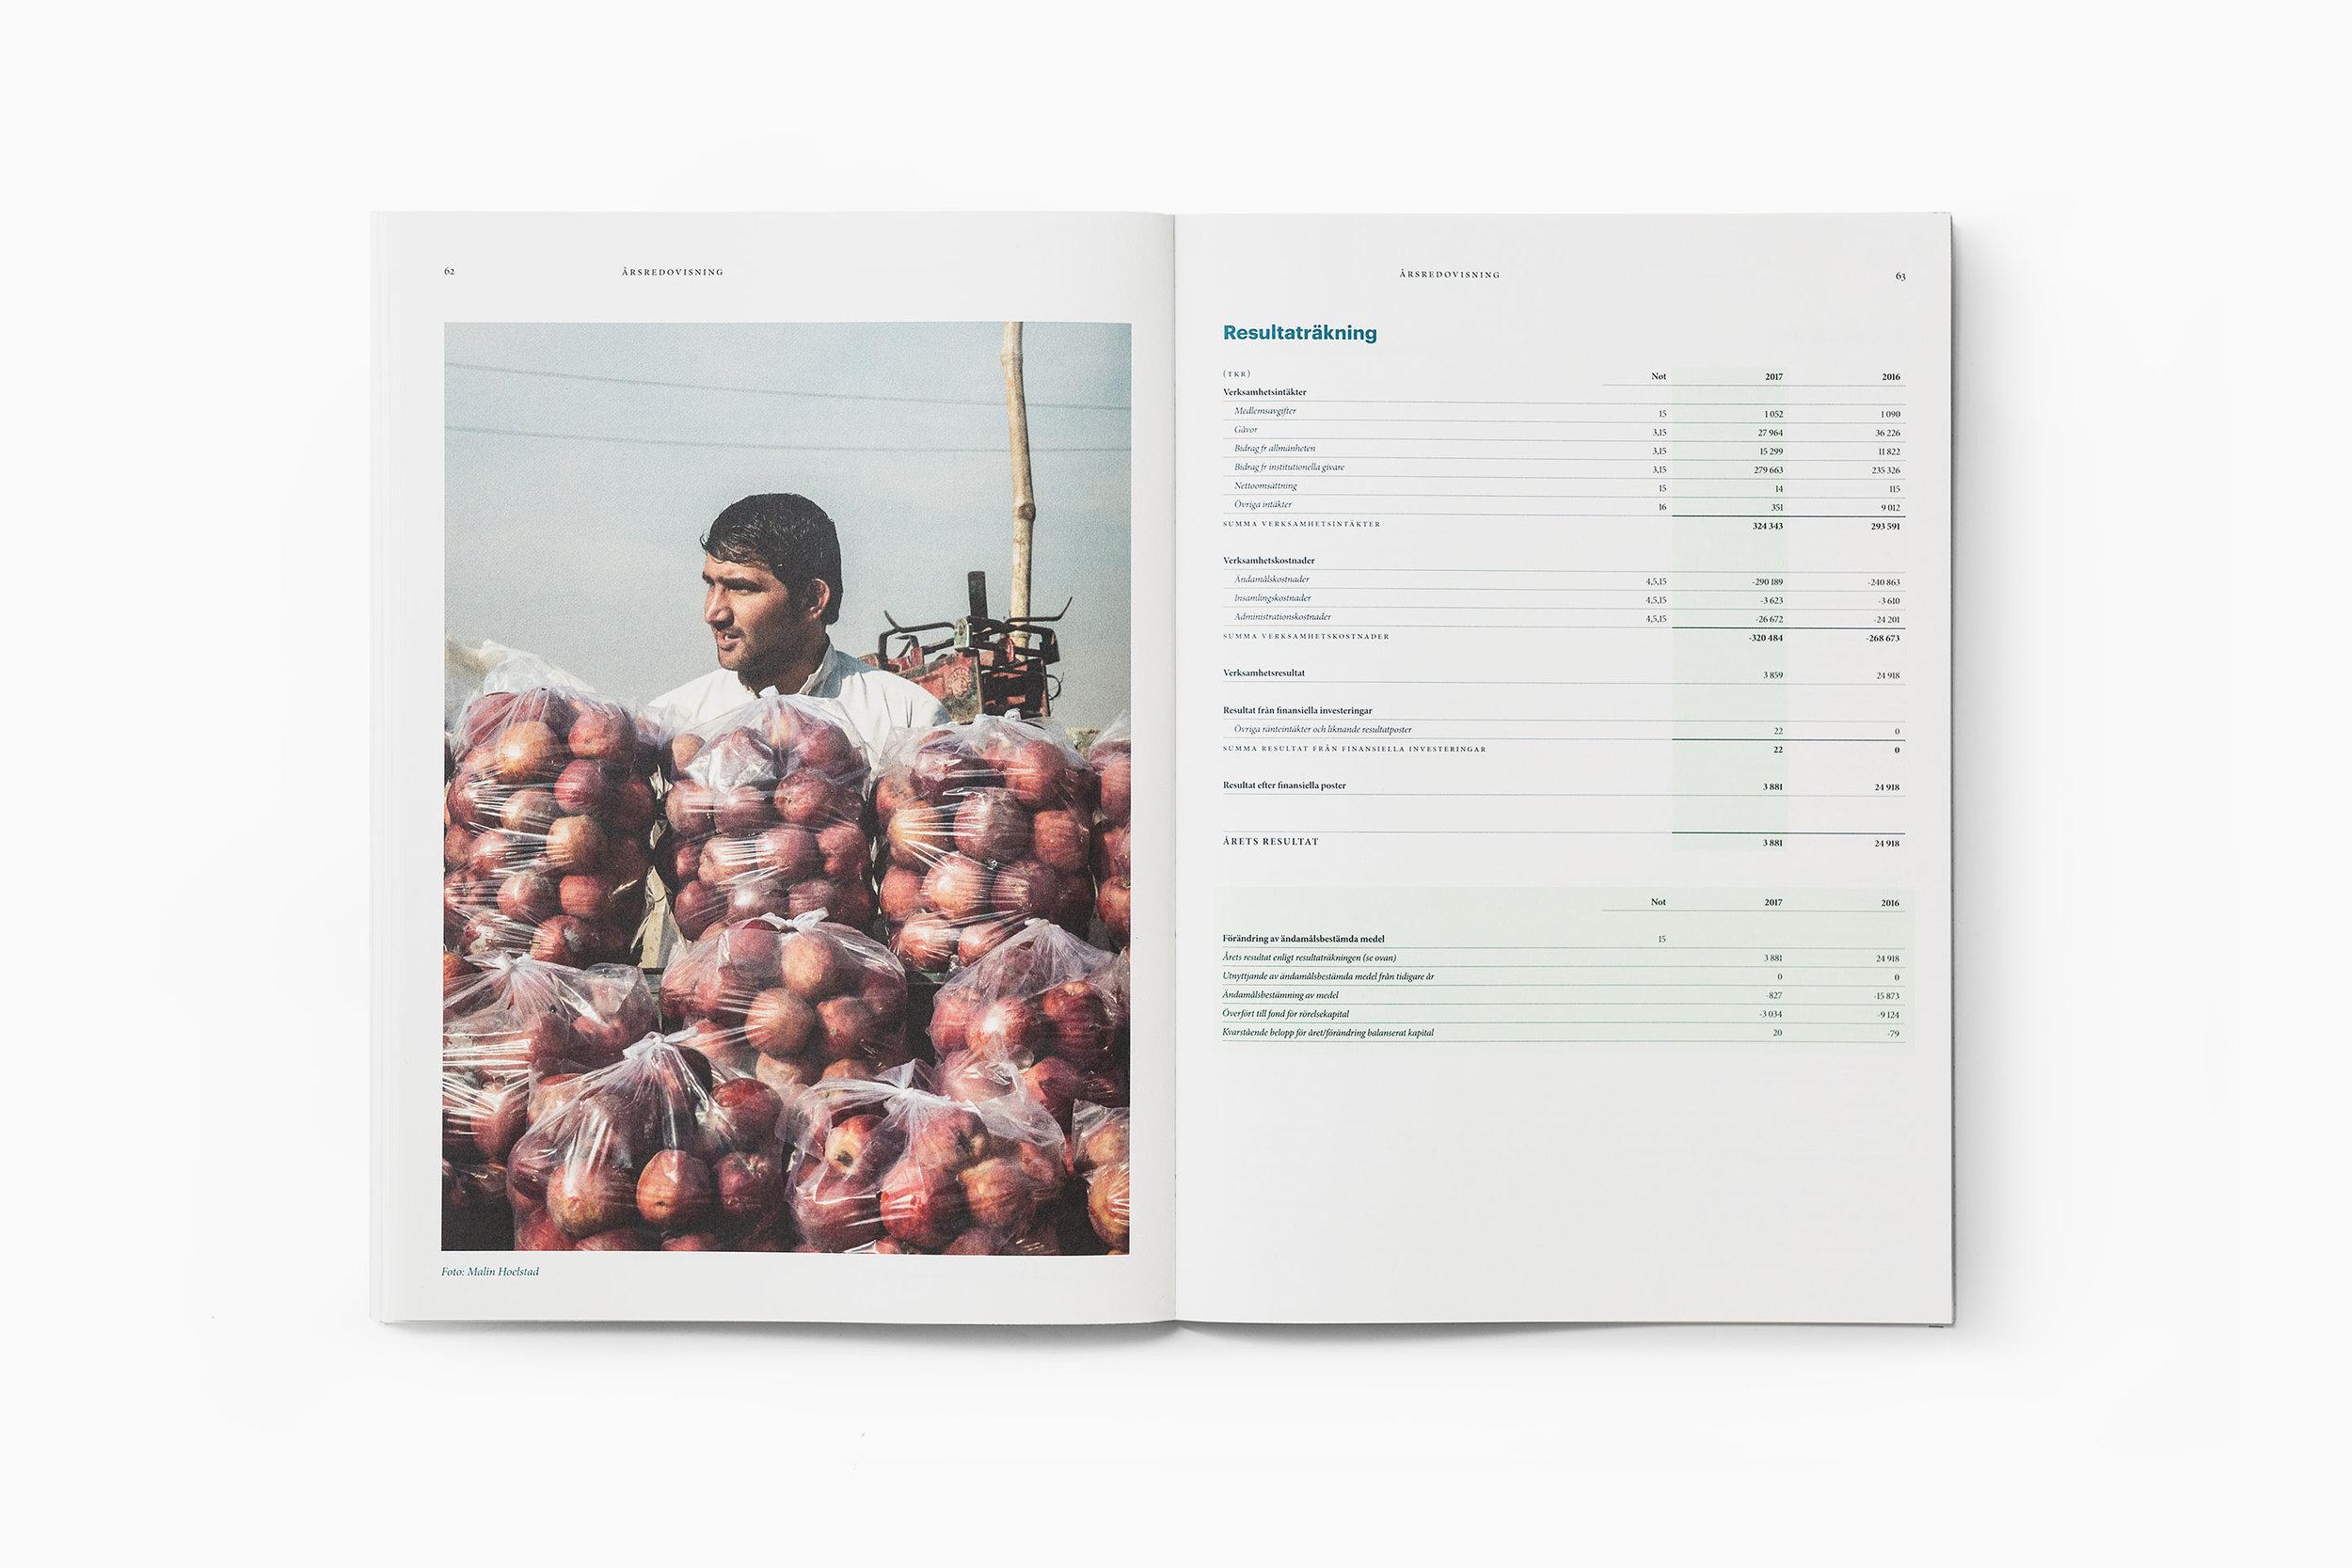 Mattias_Amnas_SAK_publication_12.jpg